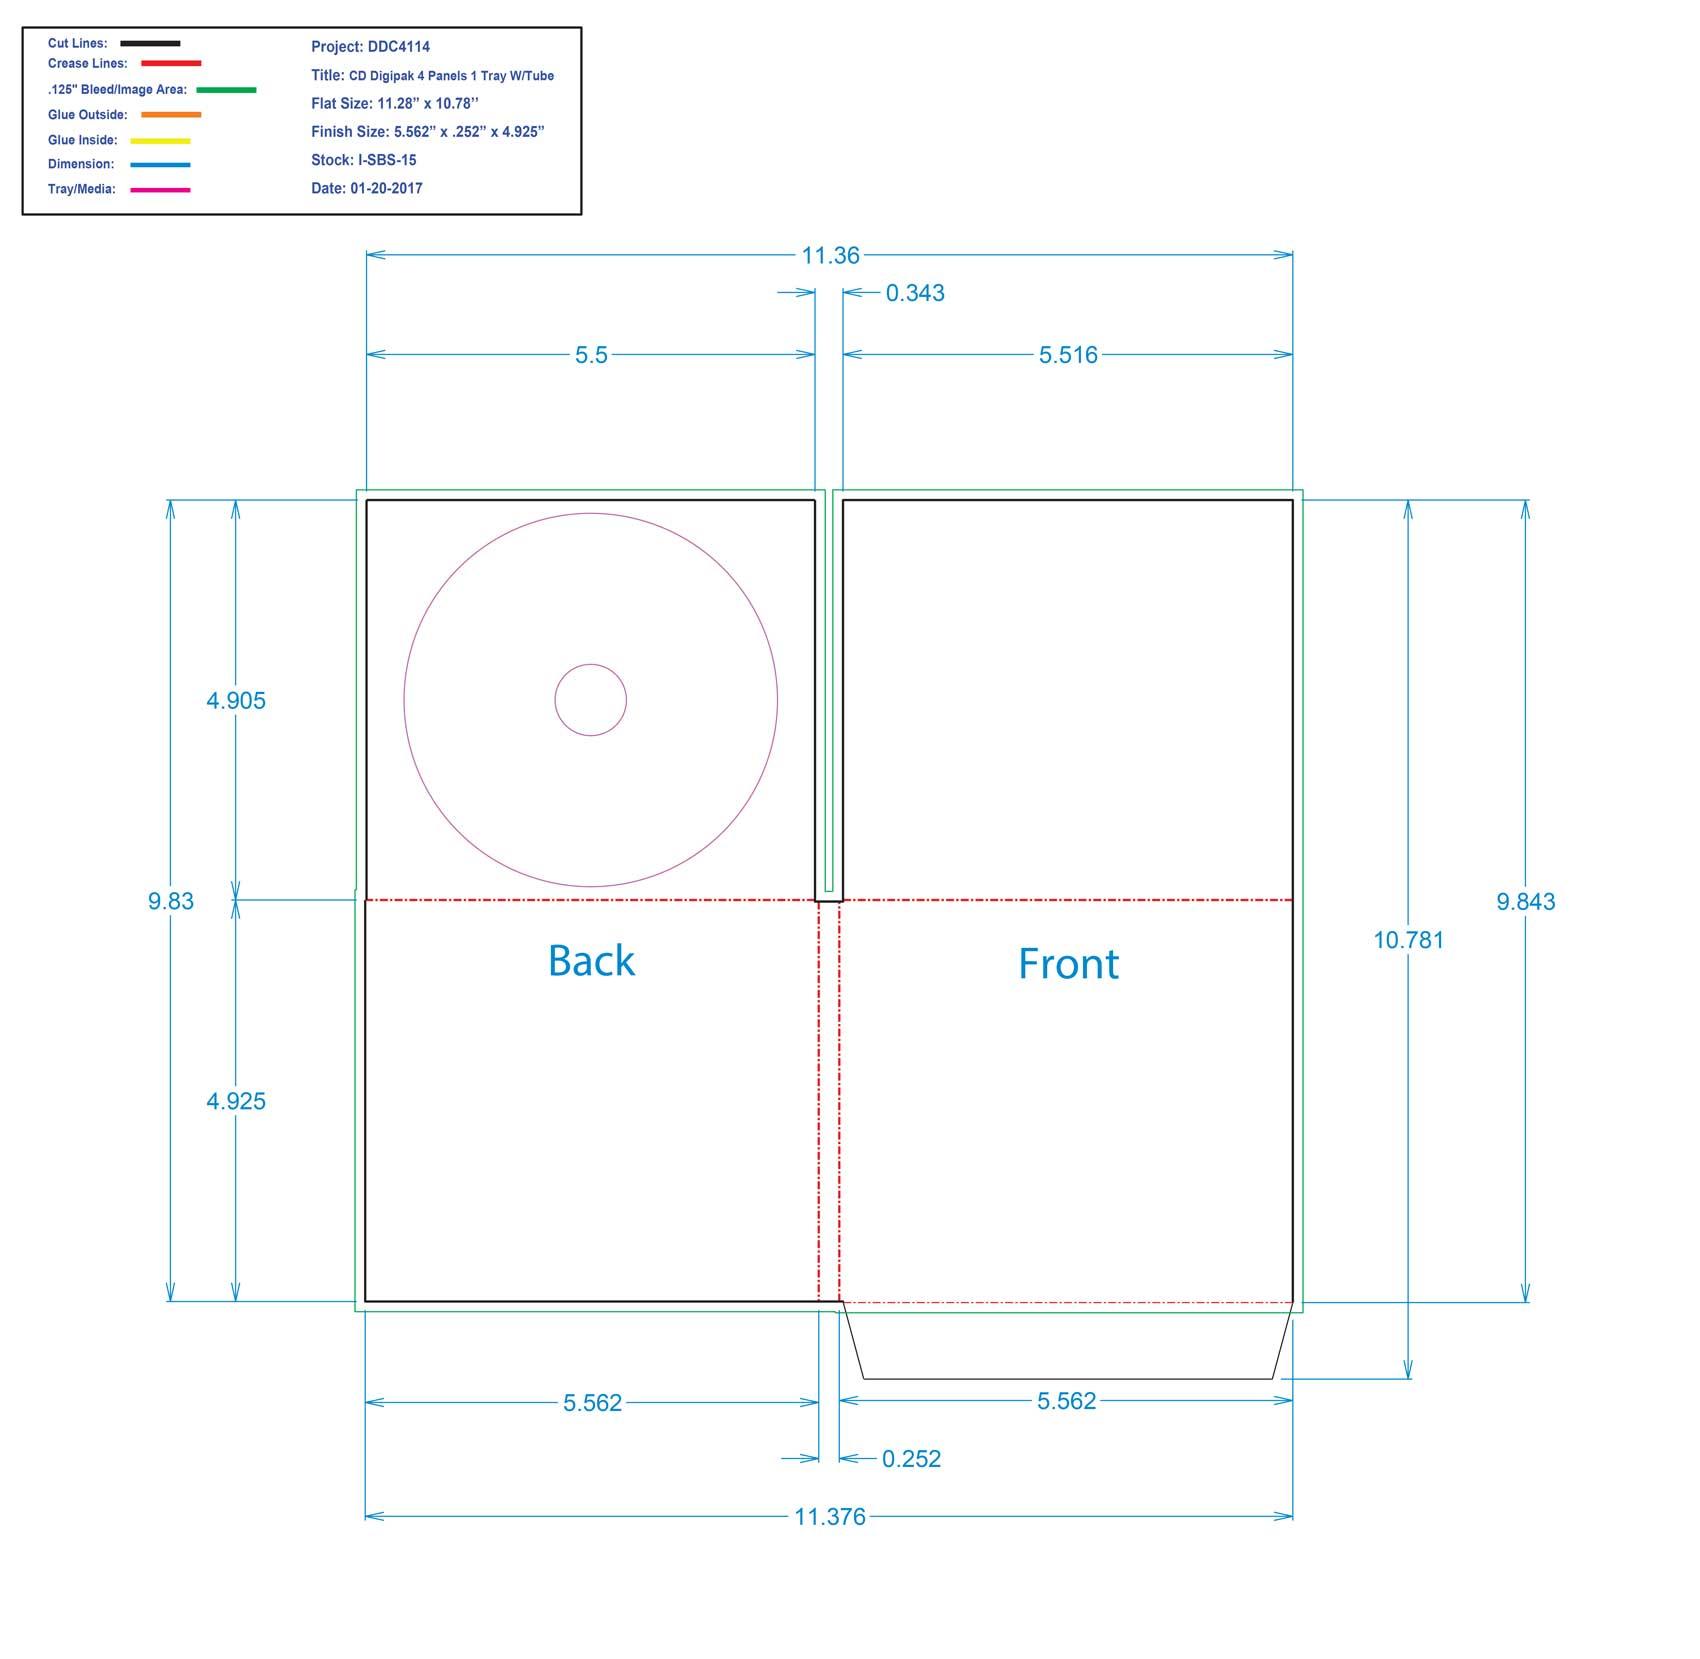 DDC4114 - 1 CD 4 Panel Digi Tray With Tube Pocket